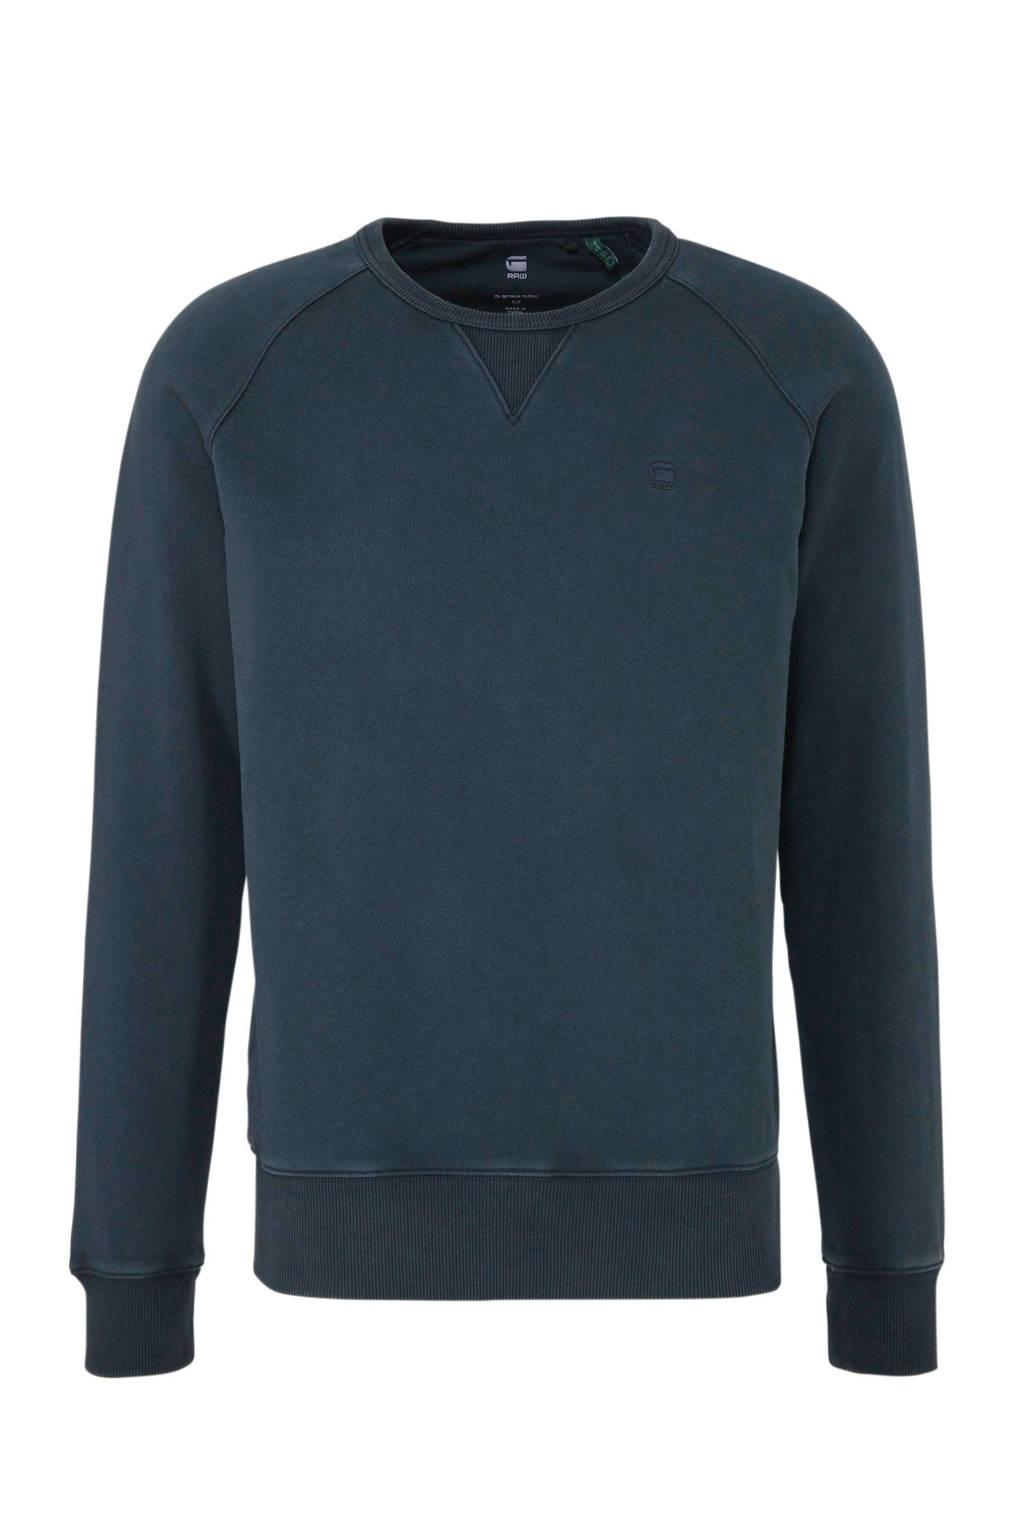 G-Star RAW sweater blauw, Blauw